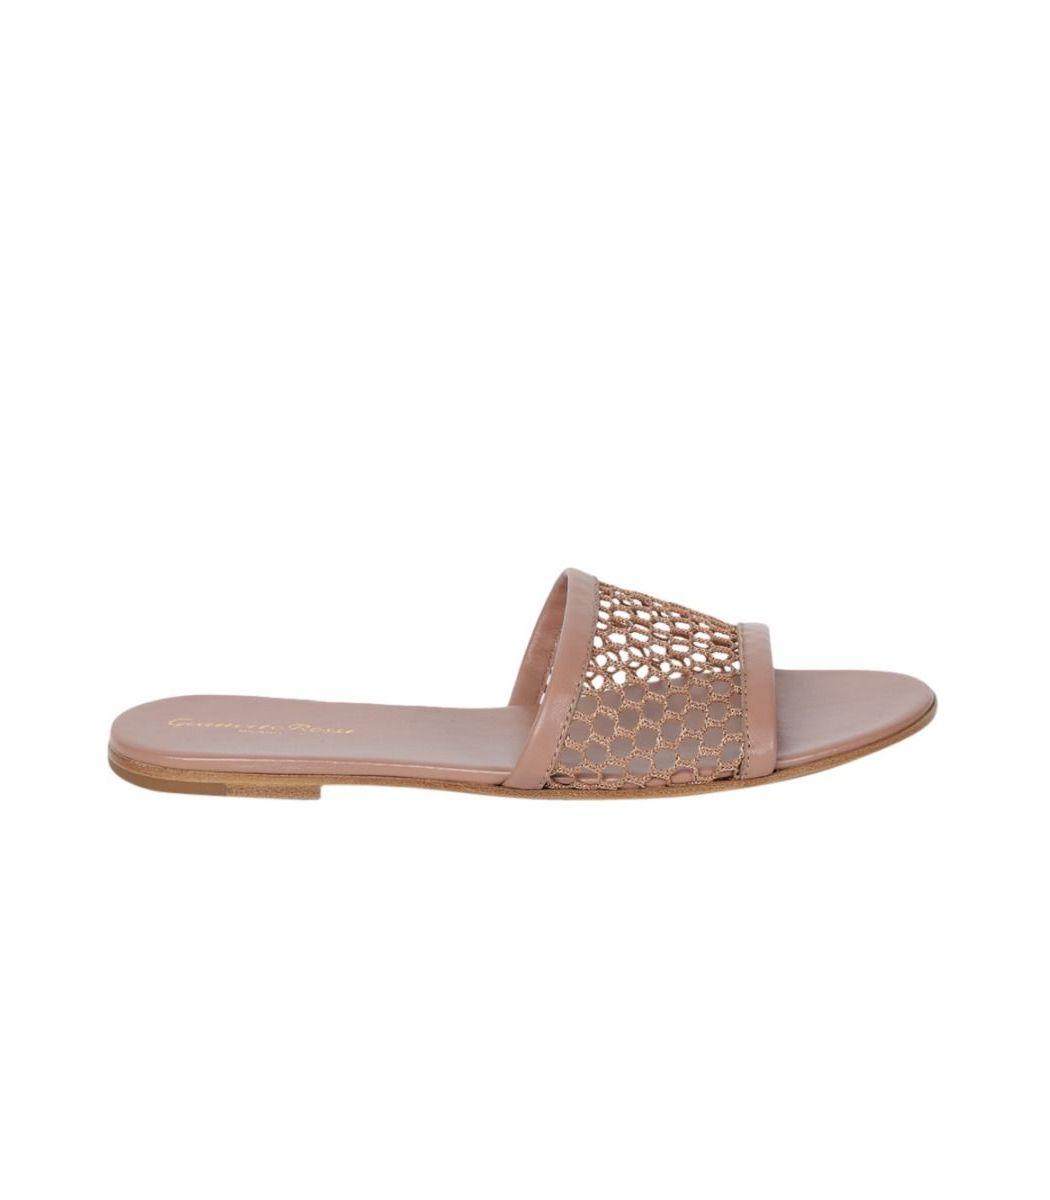 Gianvito Rossi Beige Praline Slip-on Sandal